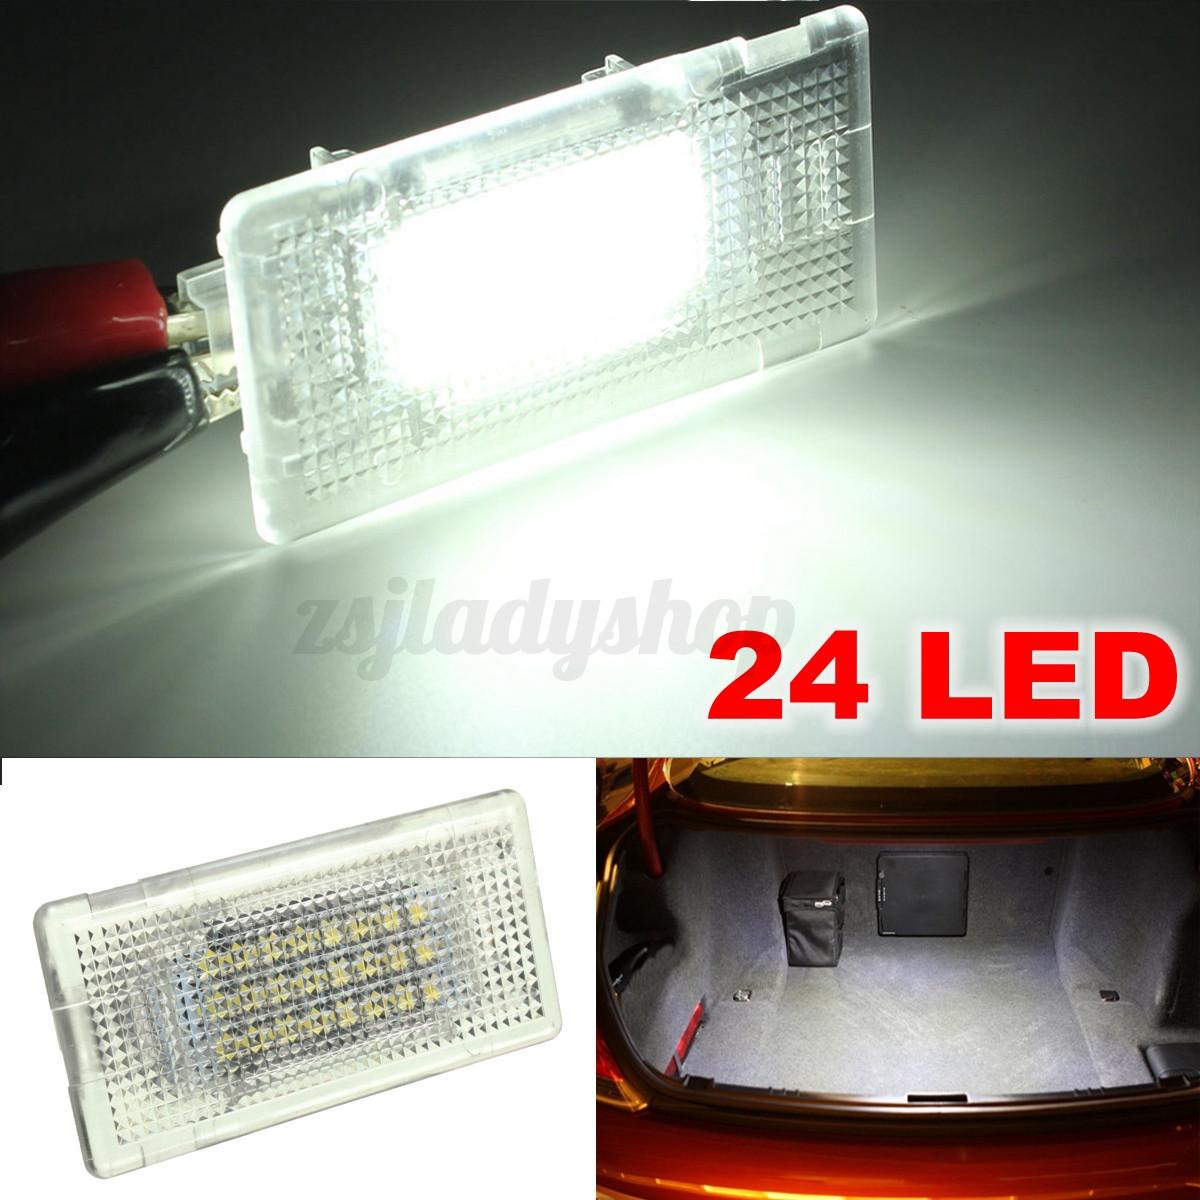 24 LED Interior Light Footwell Trunk Boot Glove Box Lamp For BMW E36 E38 E39 E46